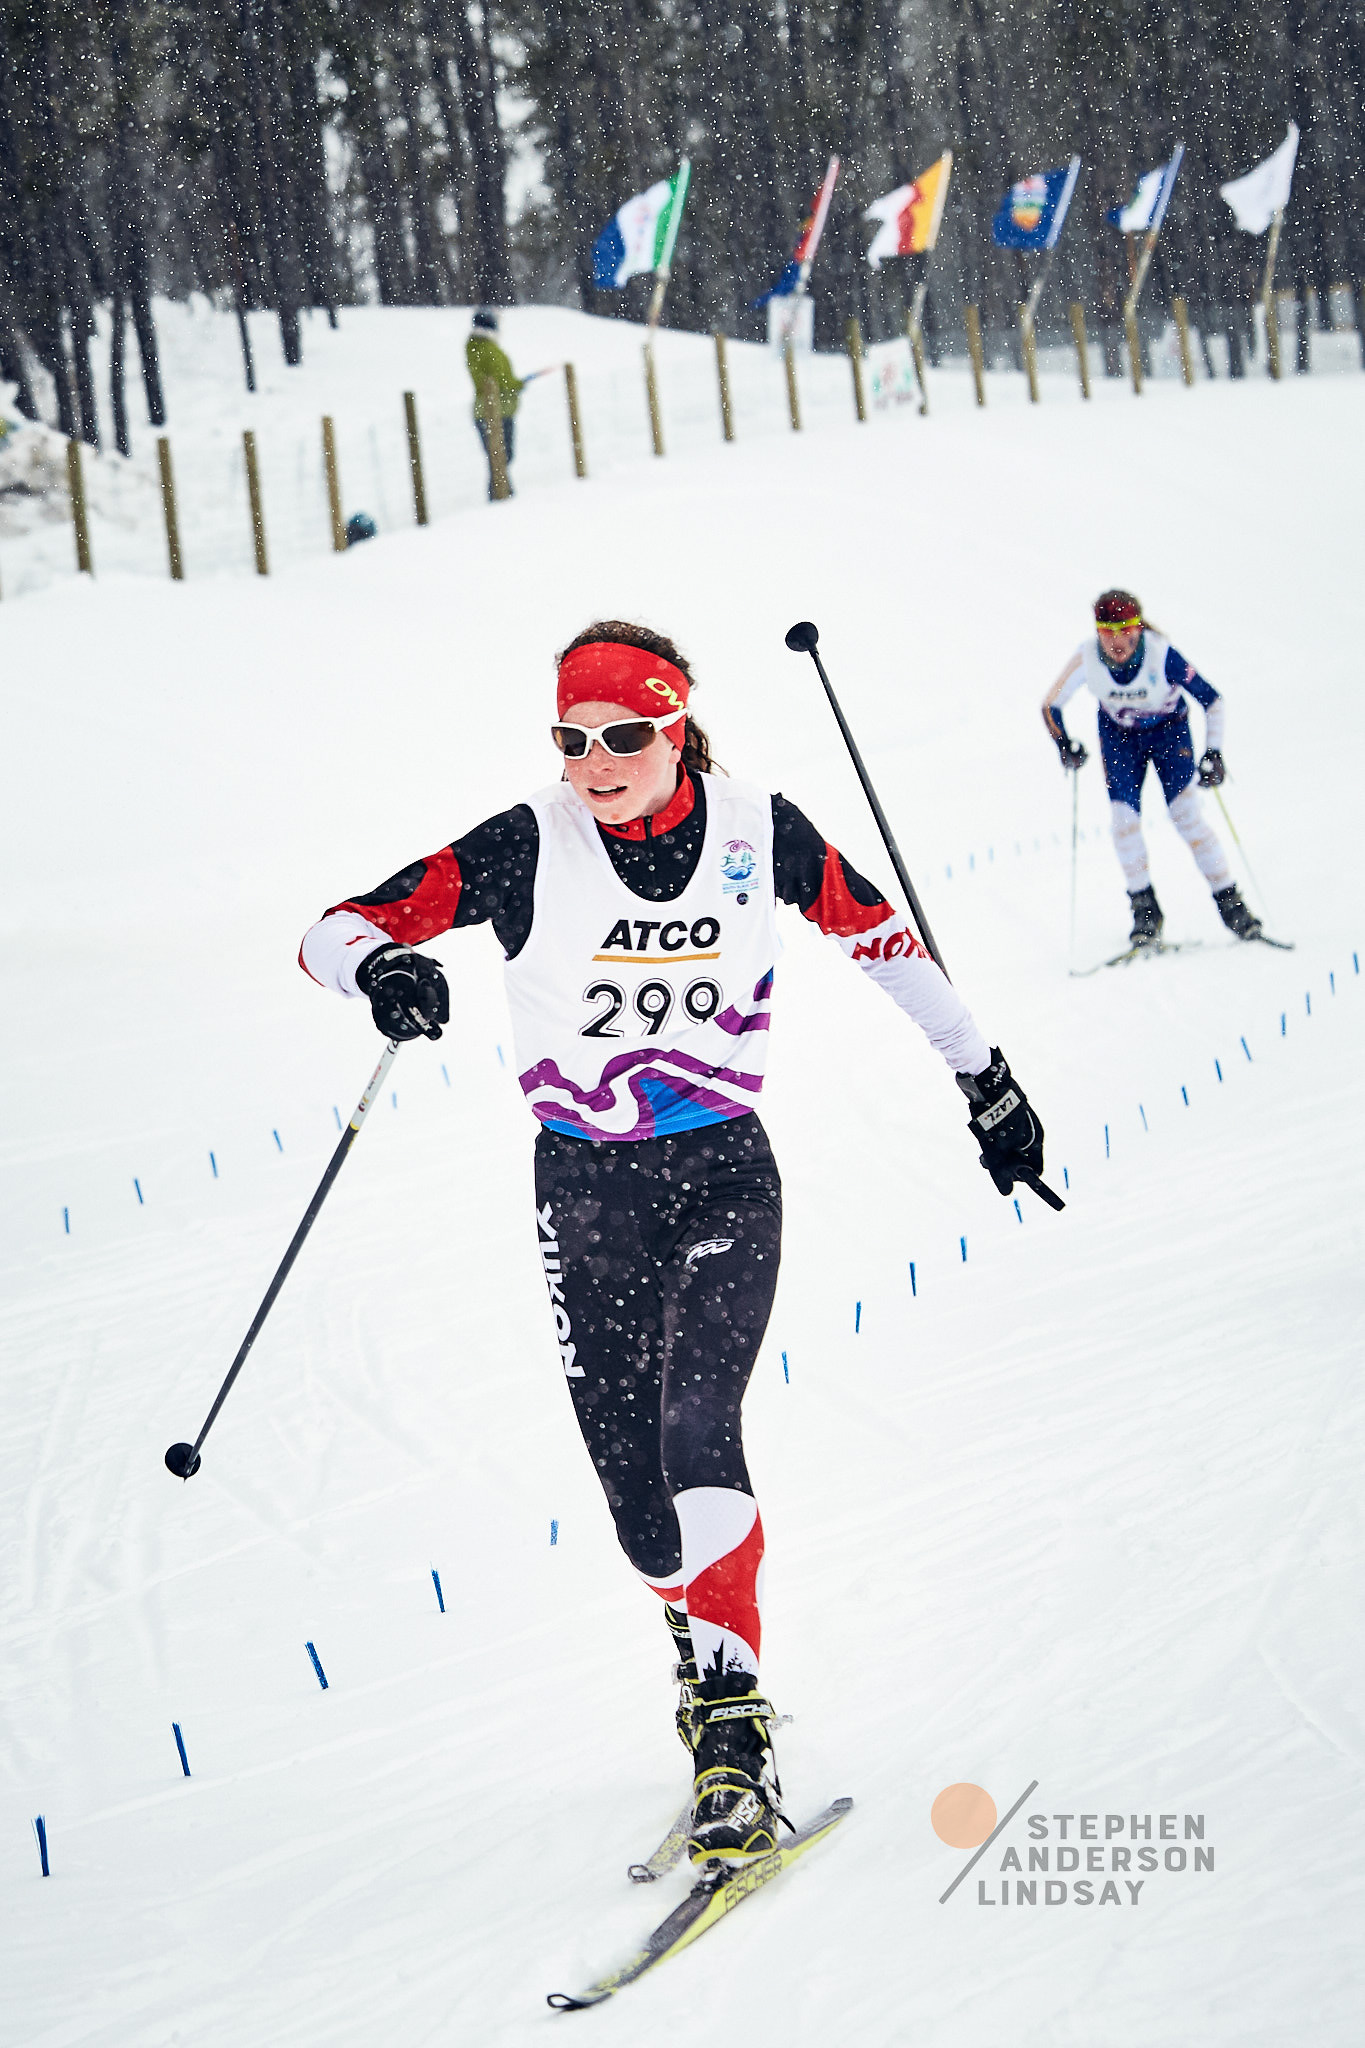 _O3Q6190_2018-Arctic-Winter-Games_Web-Gallery-JPEG-80-Full-Size-(sRGB)-1.jpg